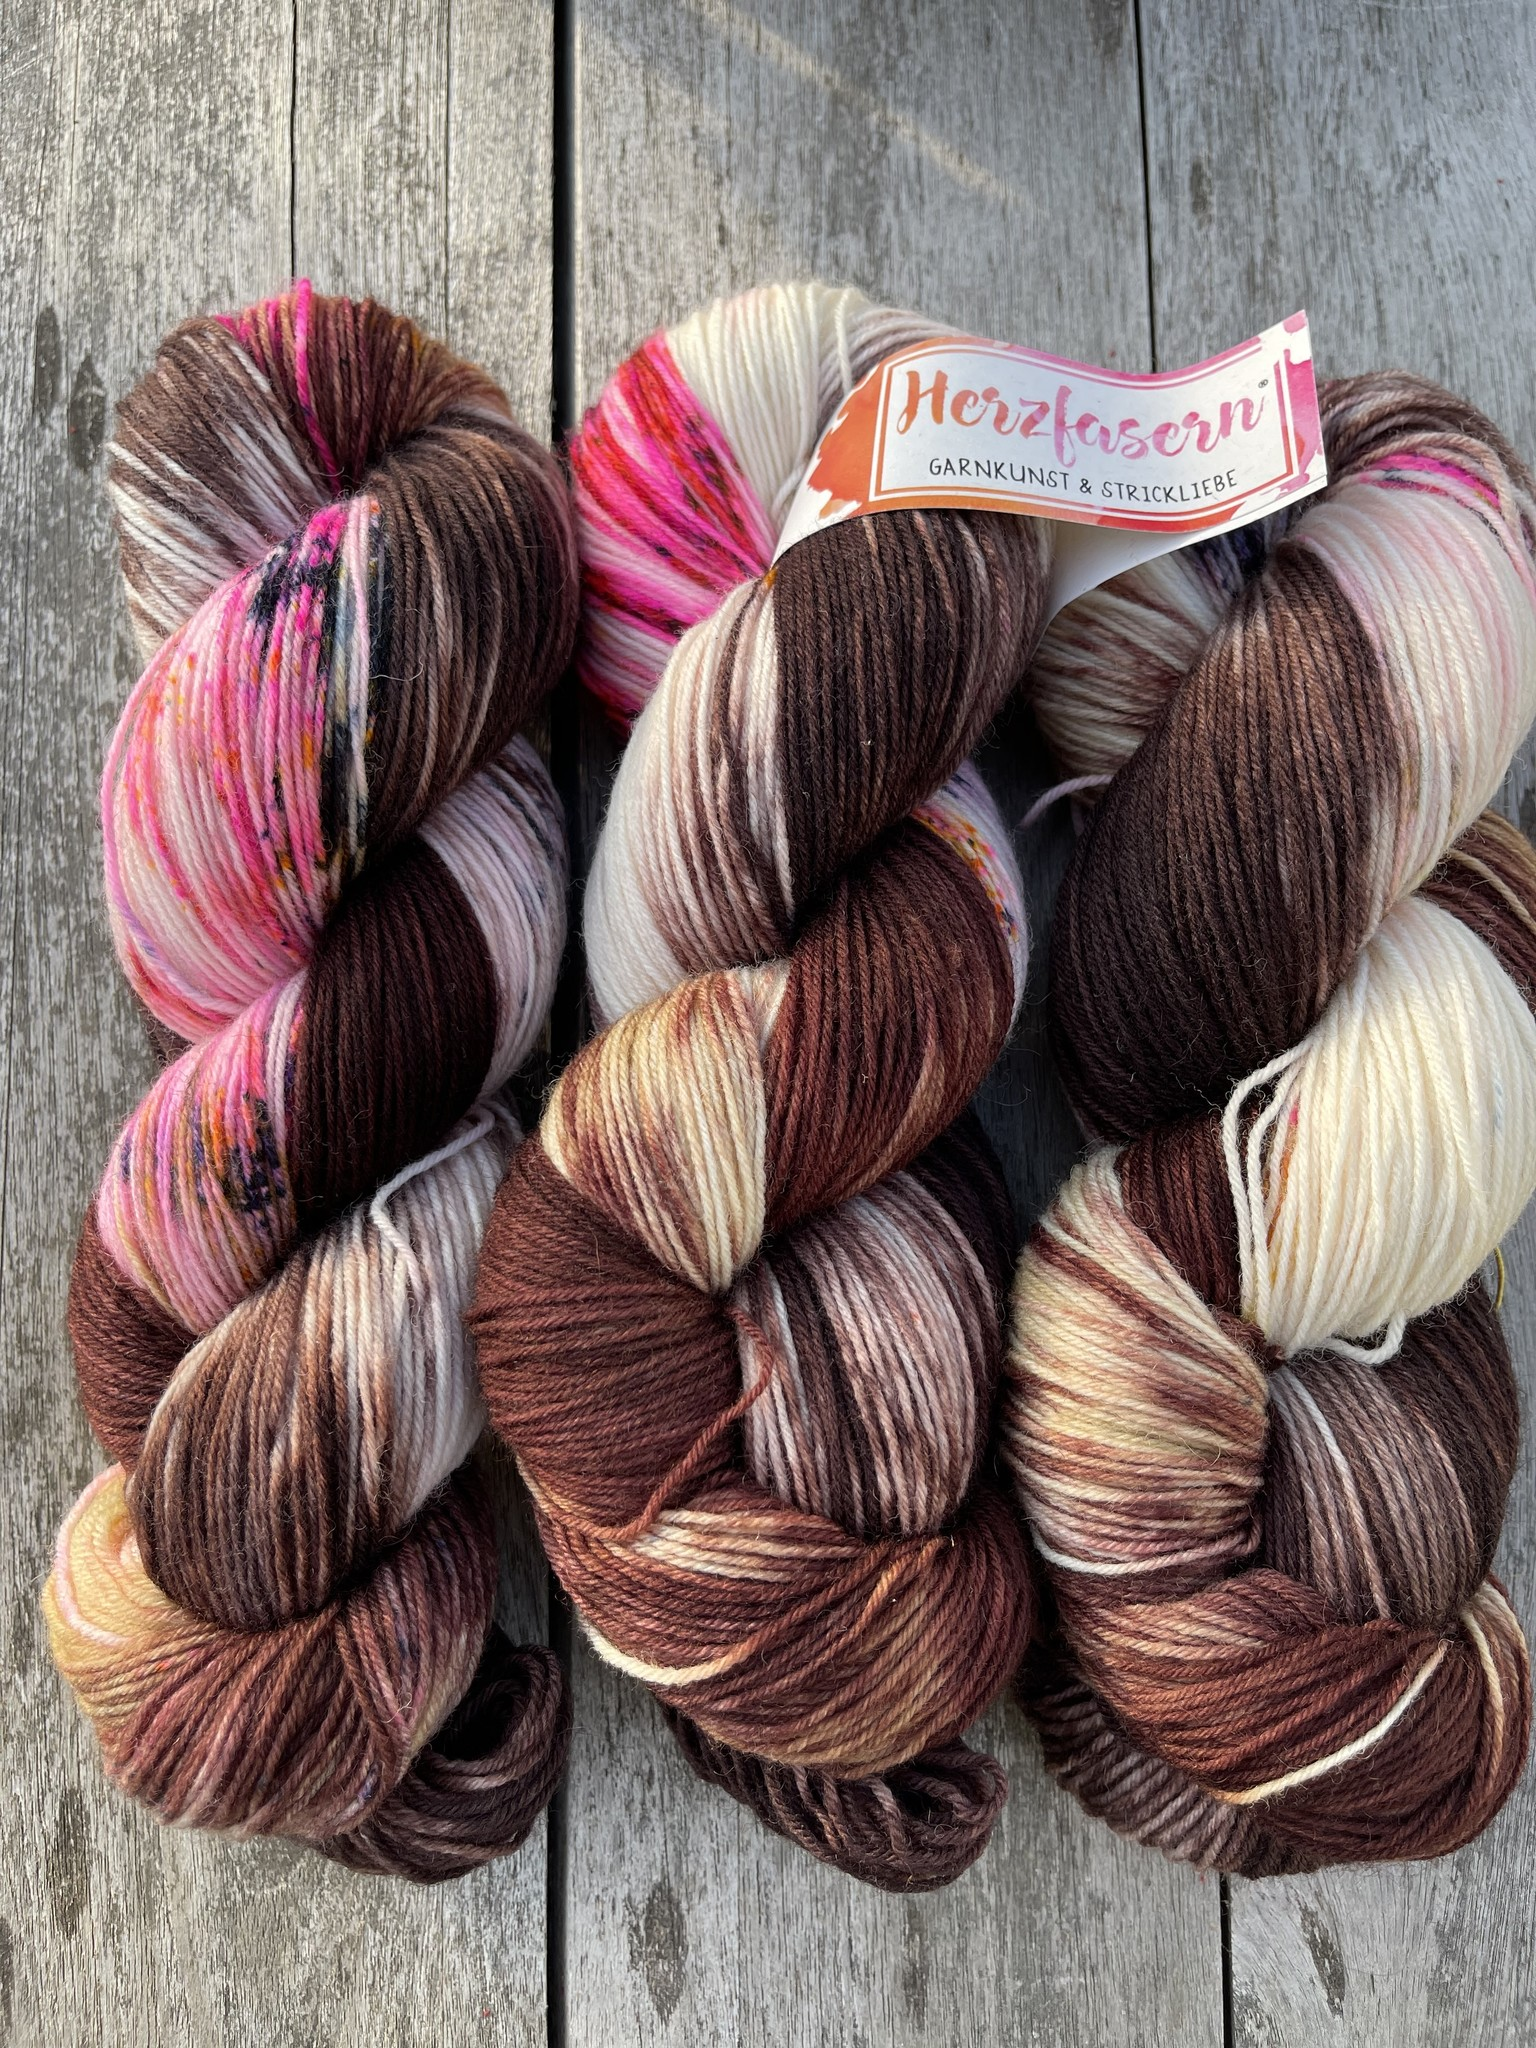 Sockenwolle - Sockenwolle mit Streusel